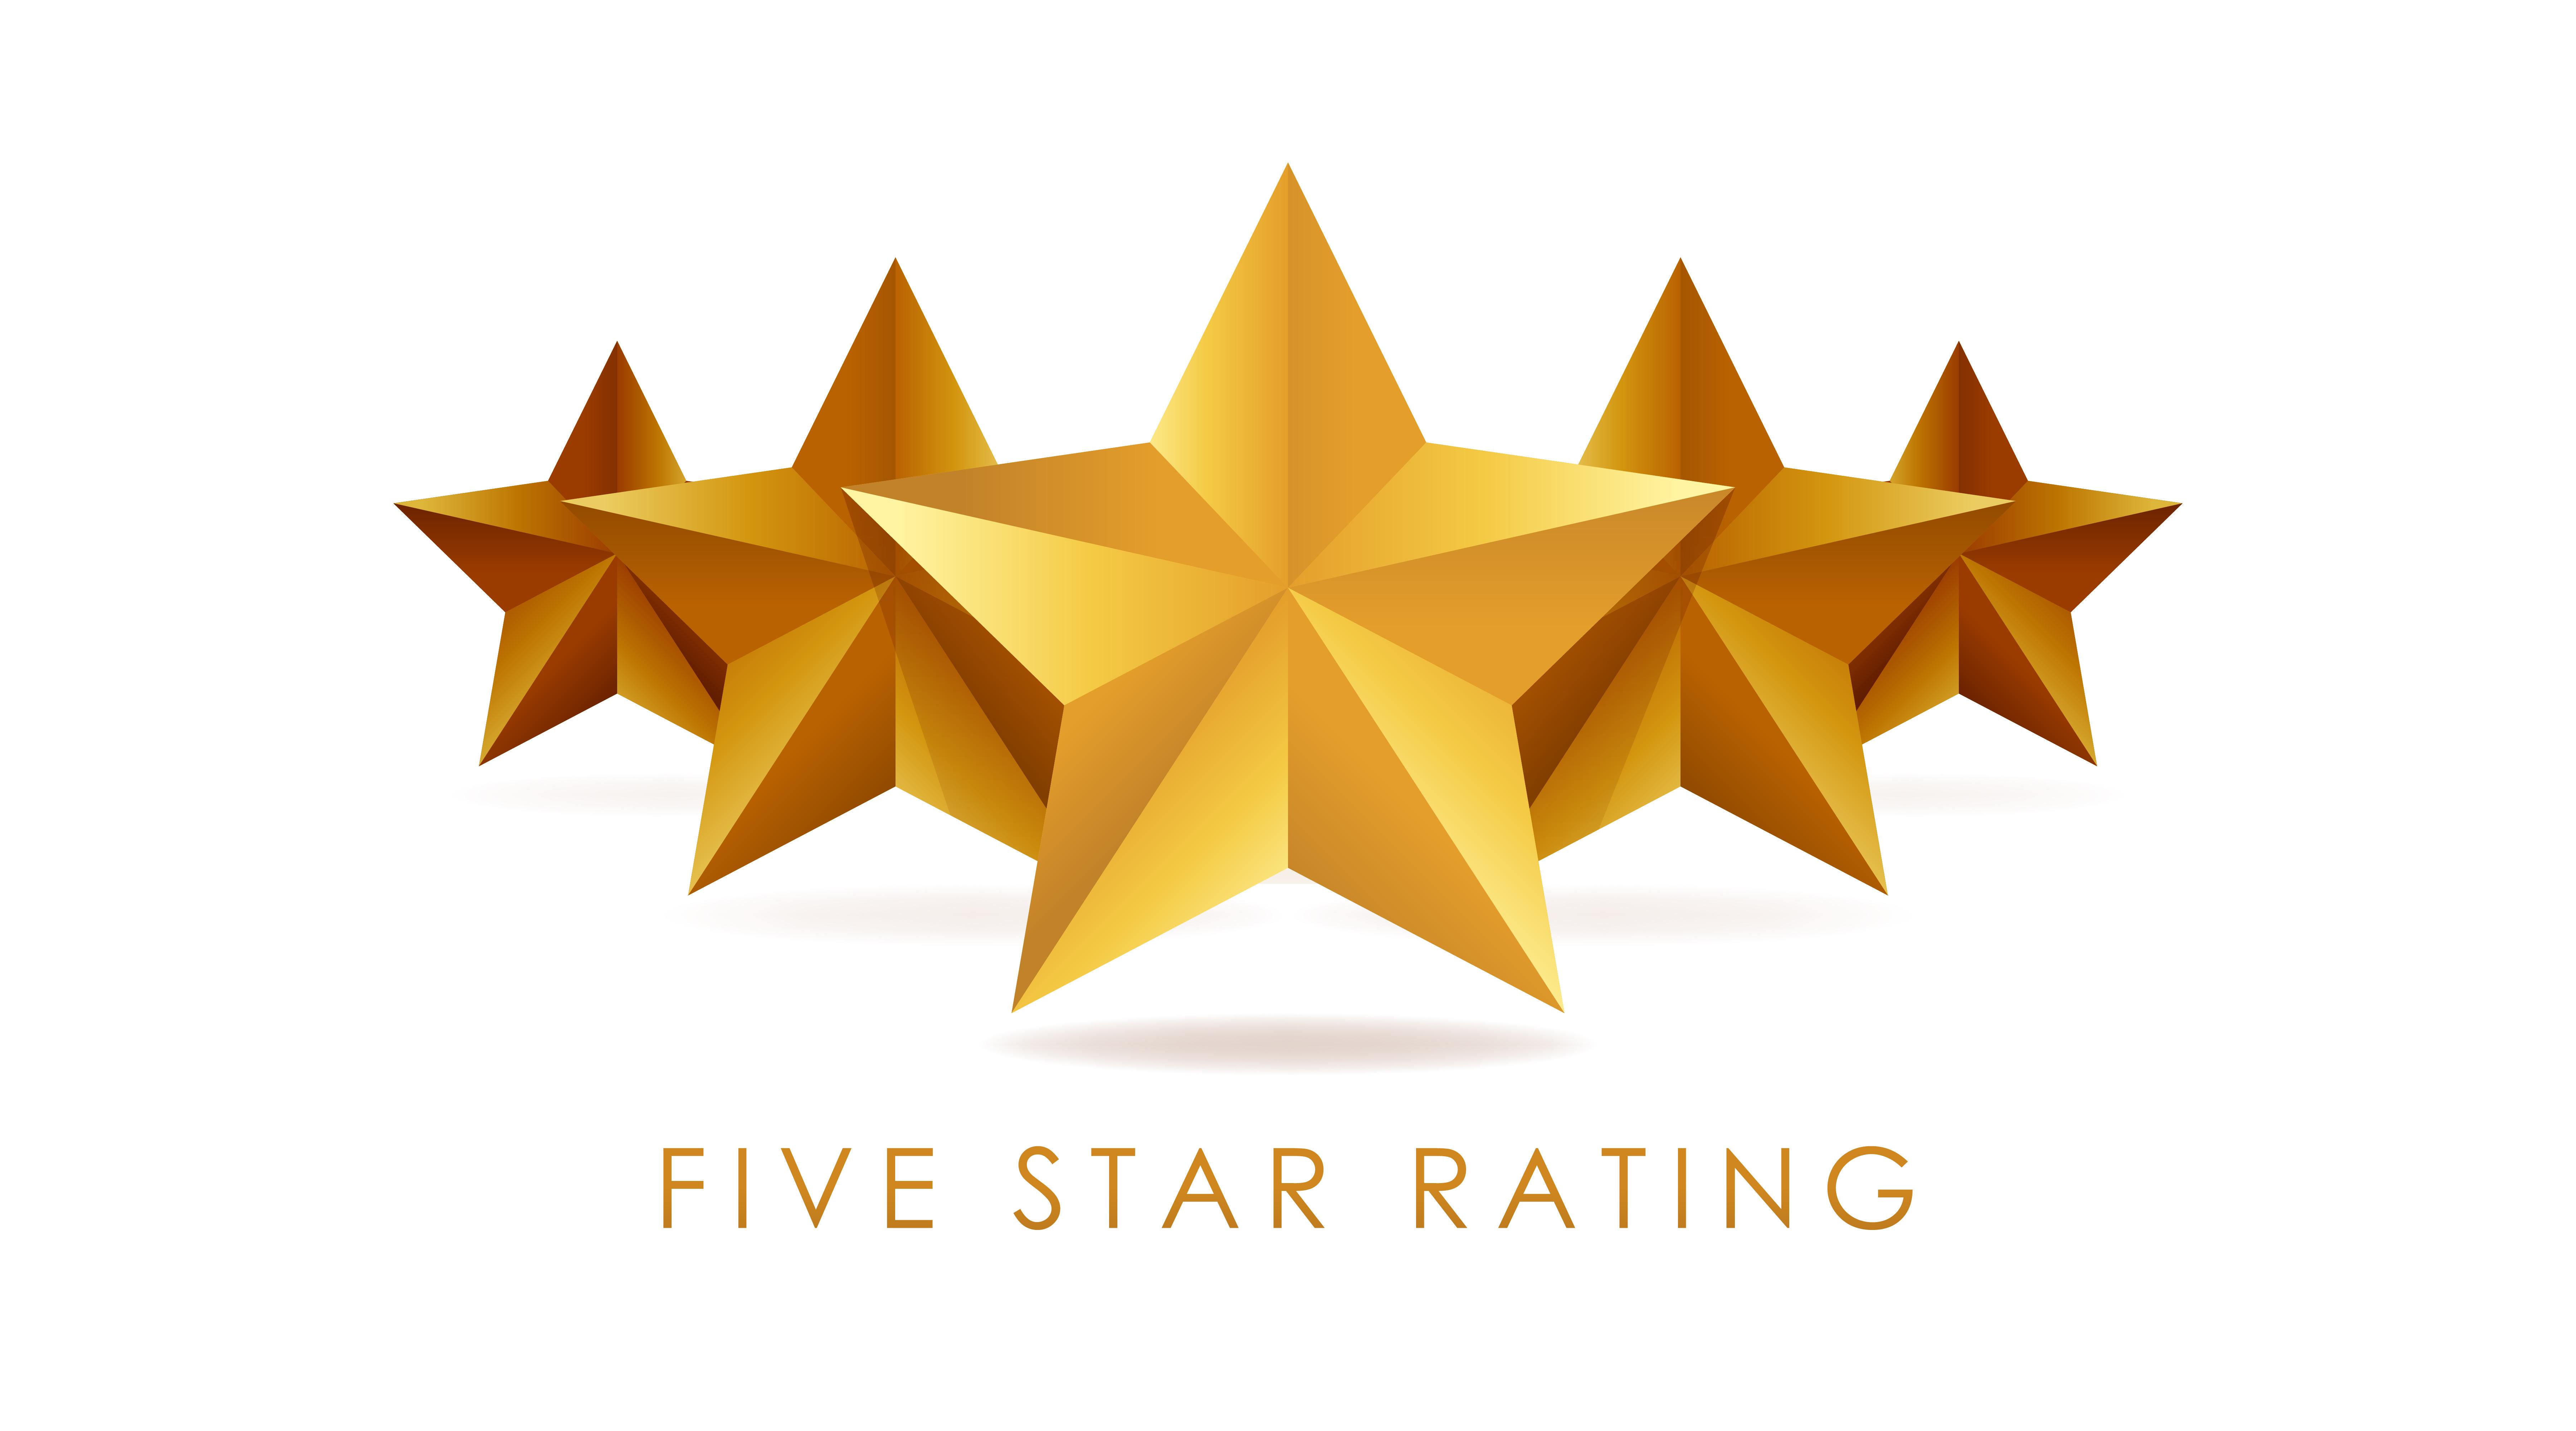 Five golden rating star vector illustration in white ... (7200 x 4000 Pixel)